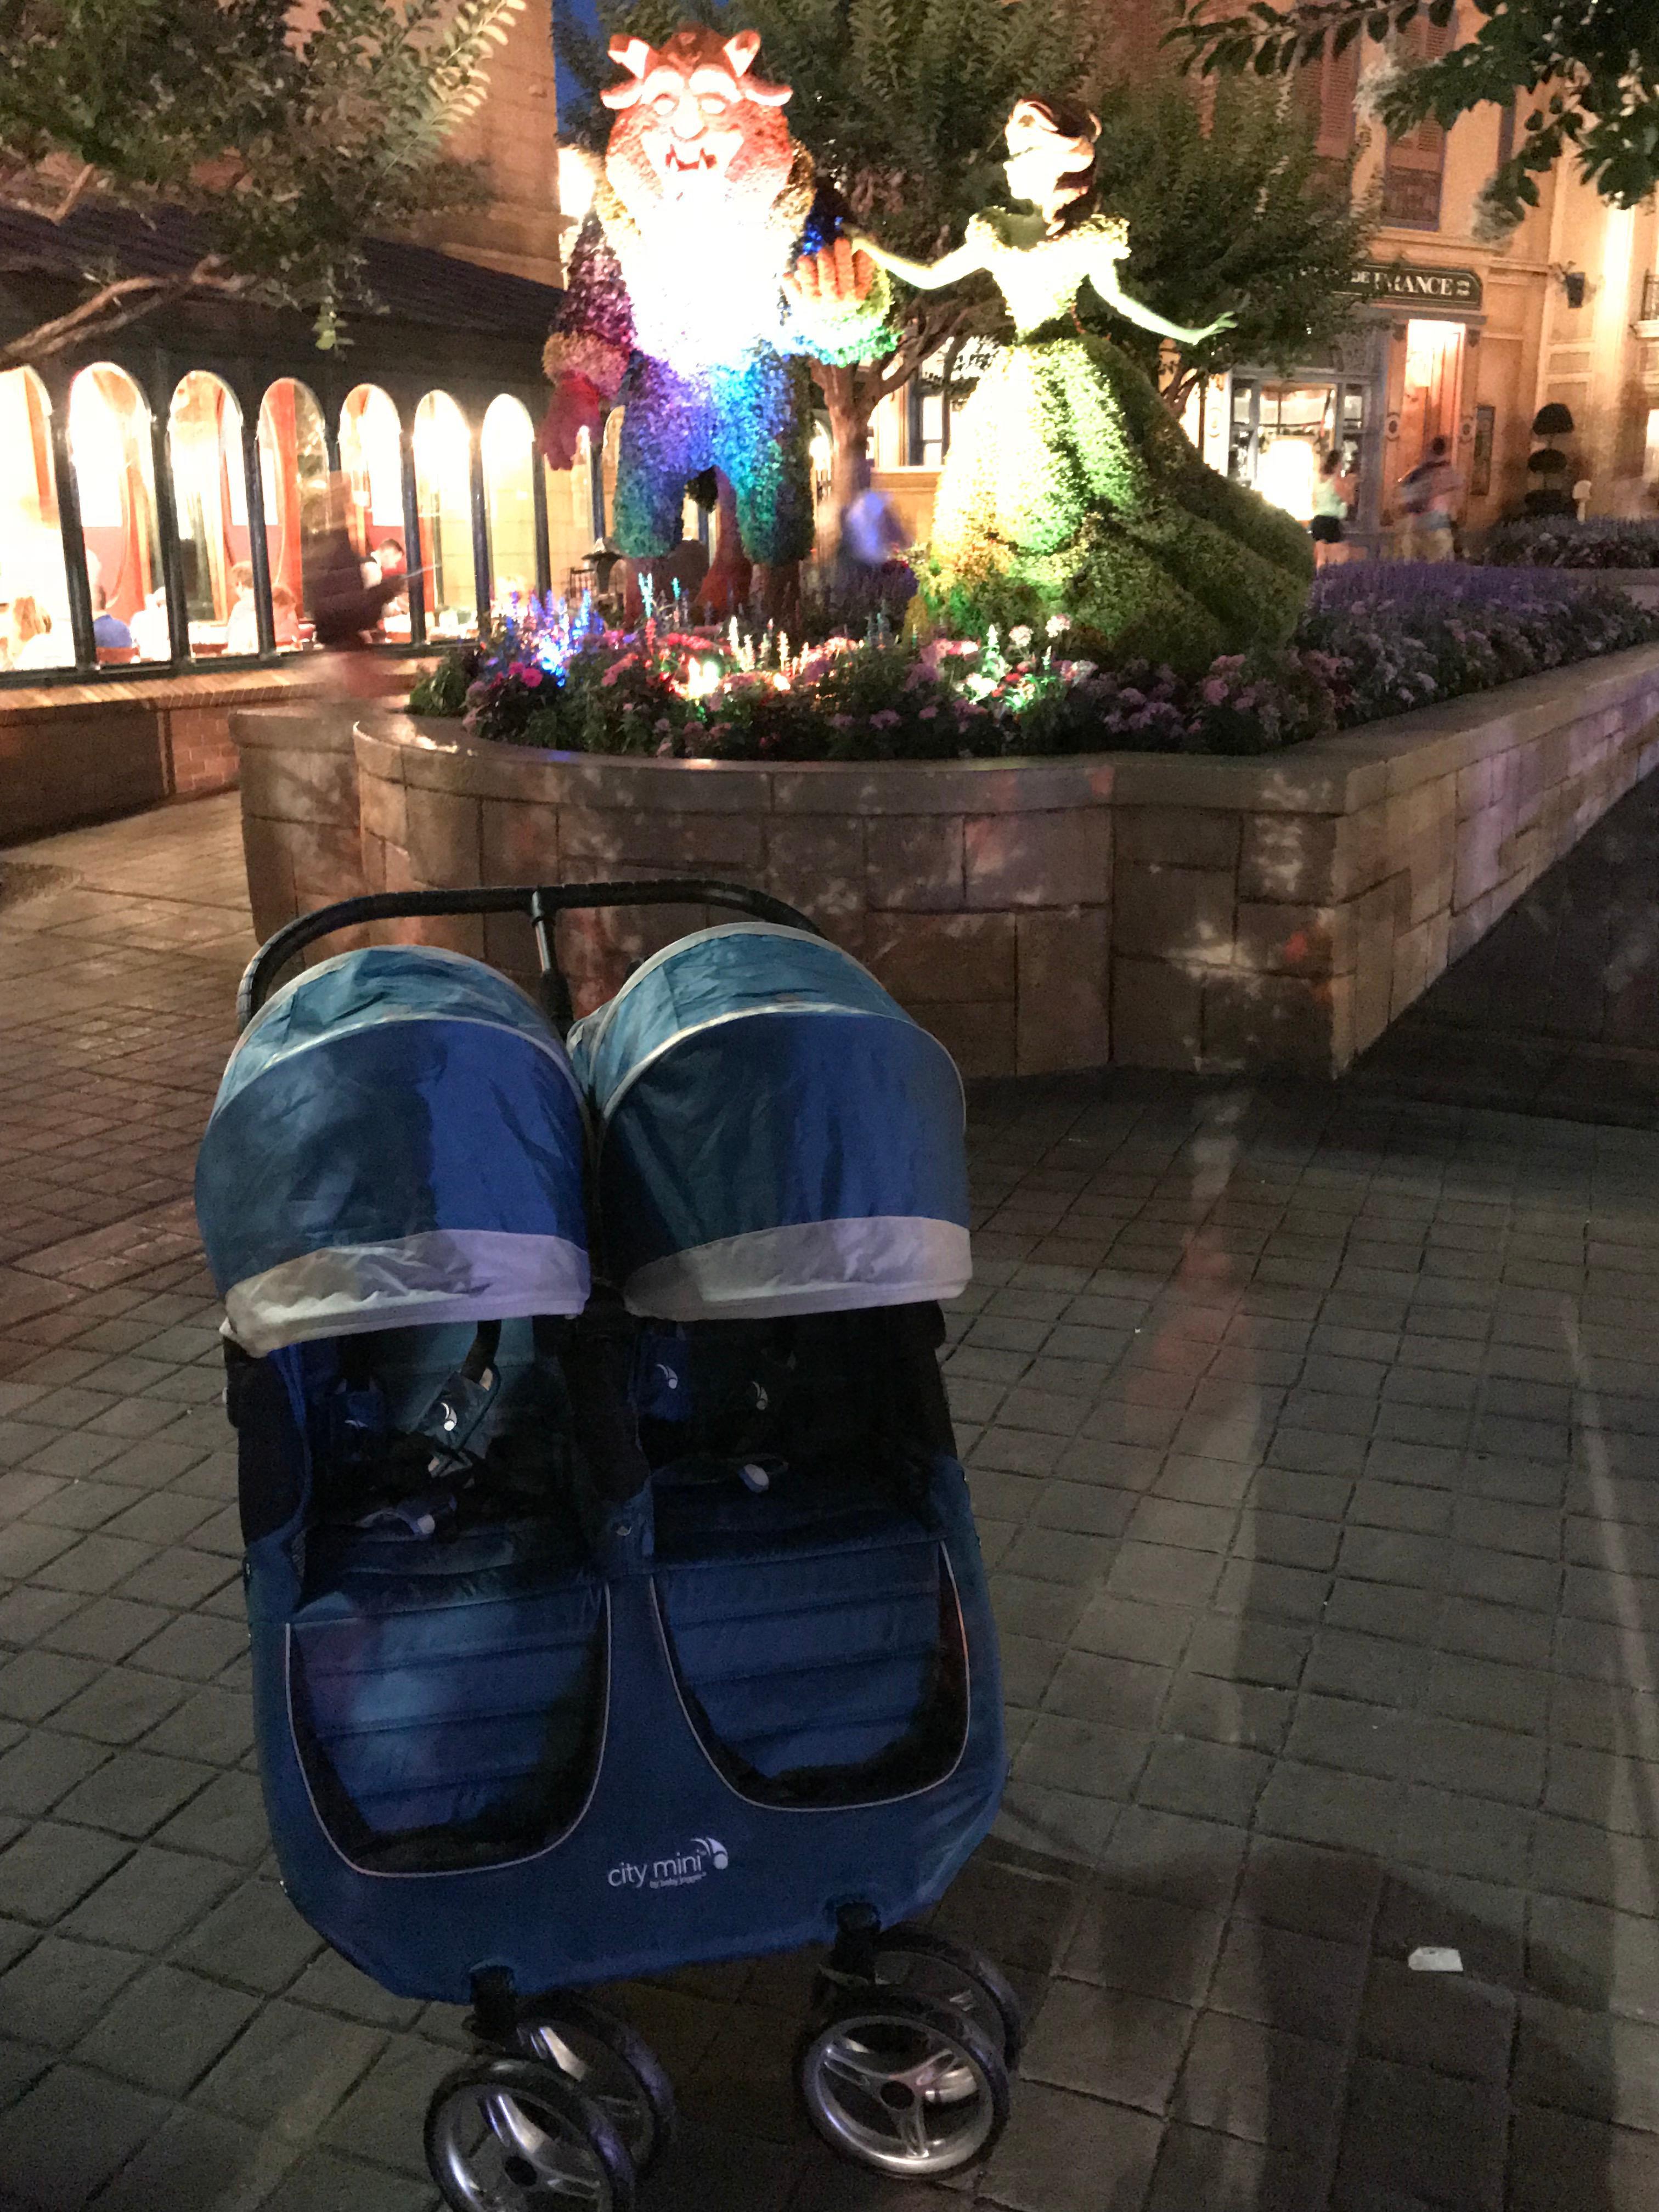 Stroller Rentals Disney image 27